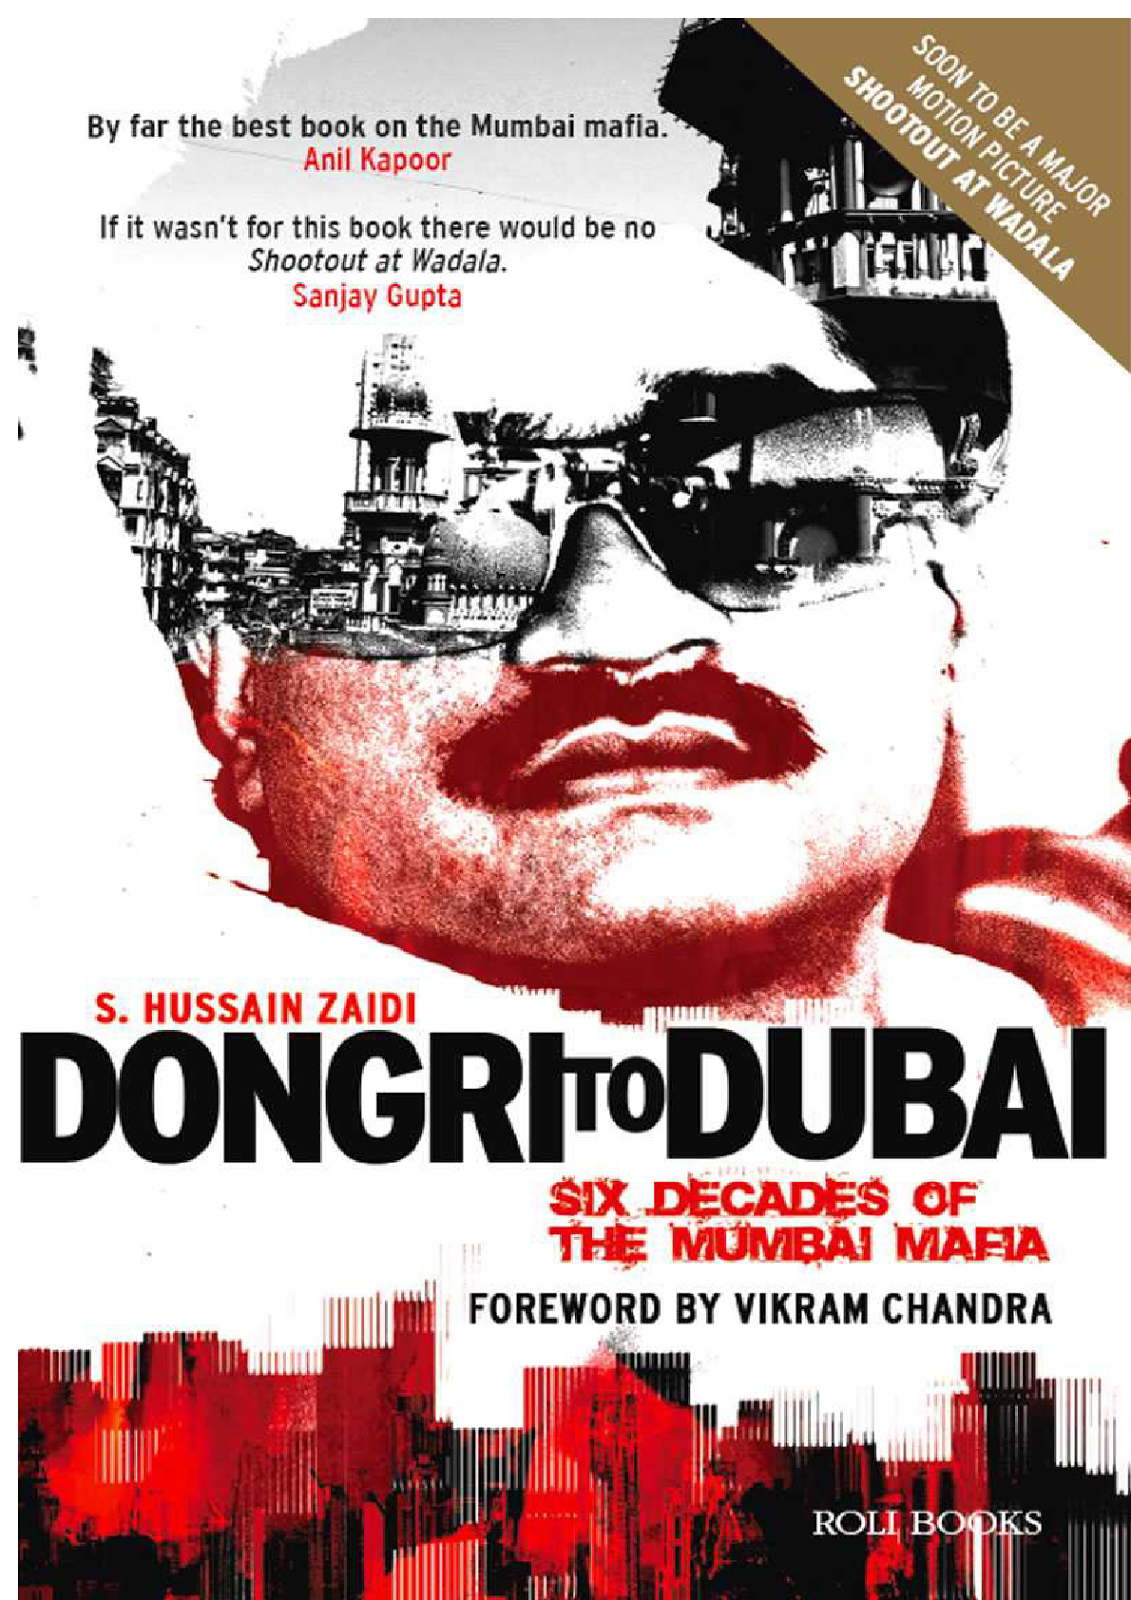 Dongri to dubai book in hindi pdf free download walkcichine.